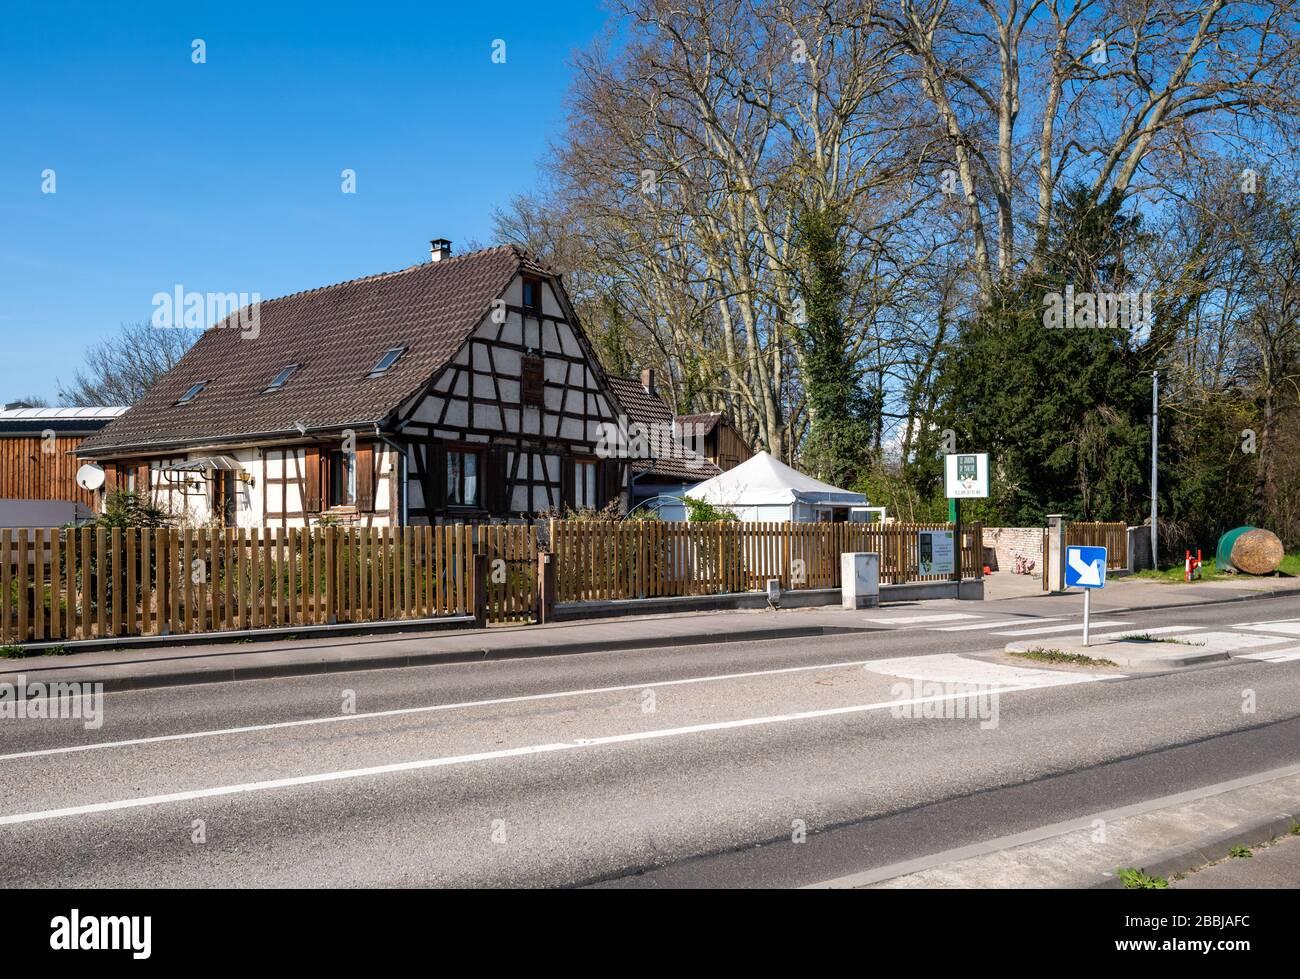 Strasbourg, France - Mar 18, 2020: Jardin de Marthe bio farmer store facade with empty street due to coronavirus outbreak Stock Photo